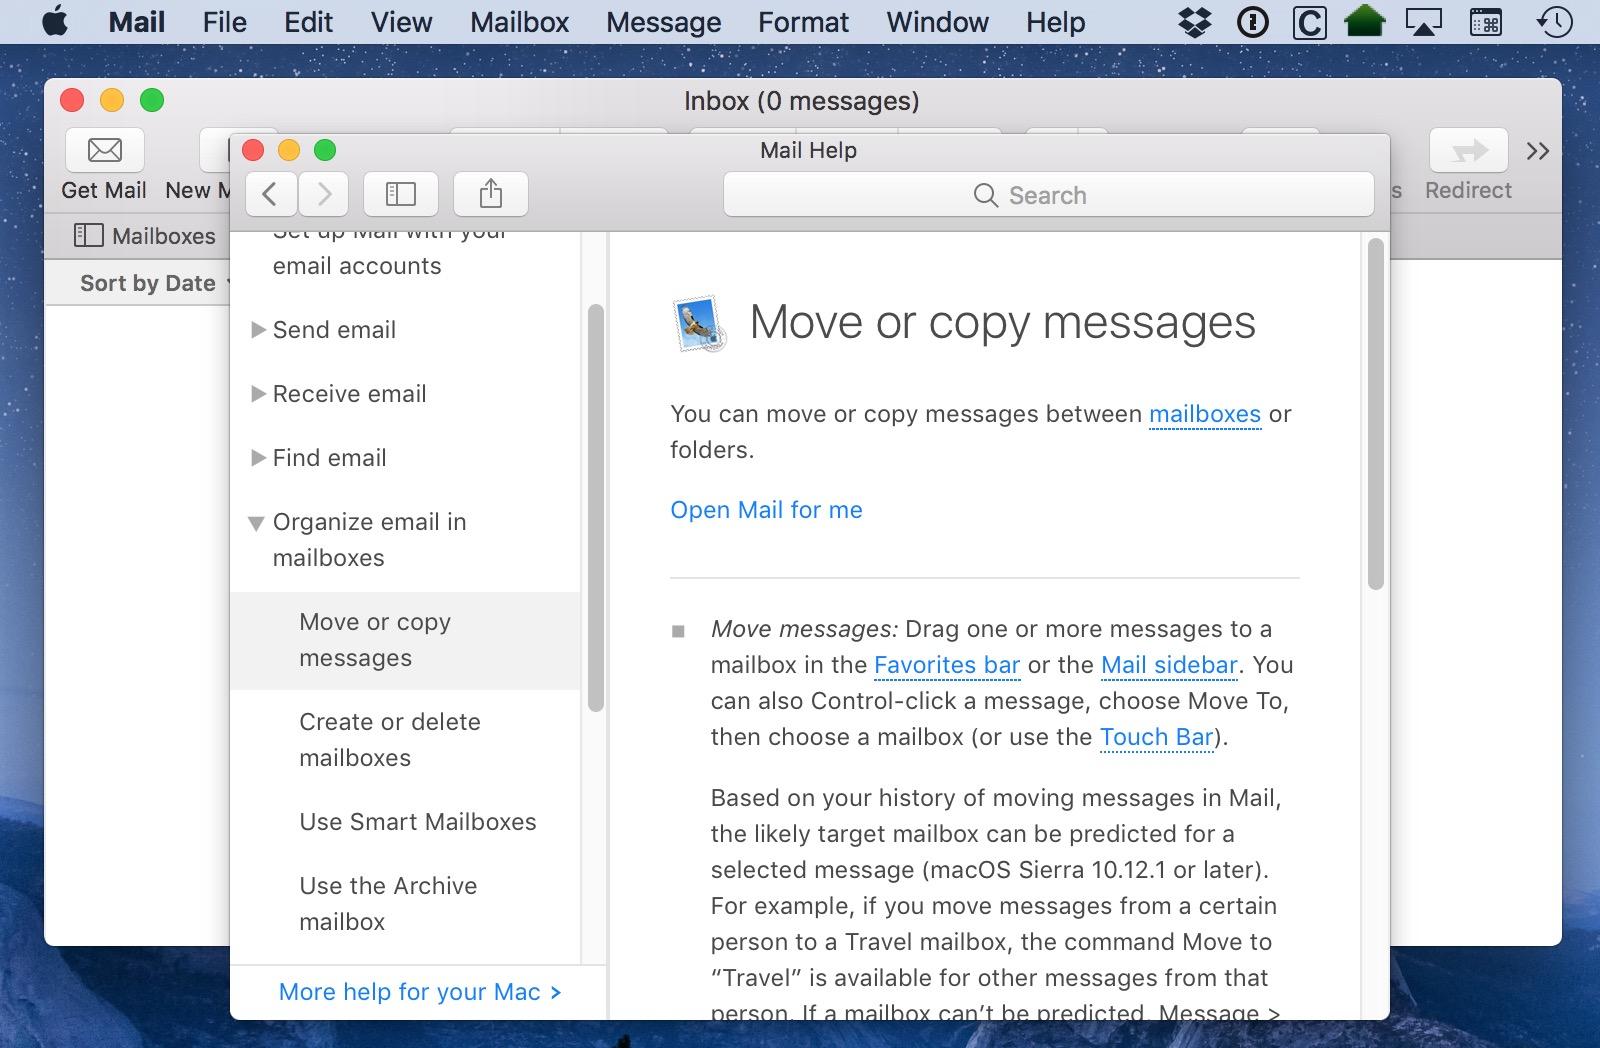 Mac Help Window blocking other apps on the Desktop